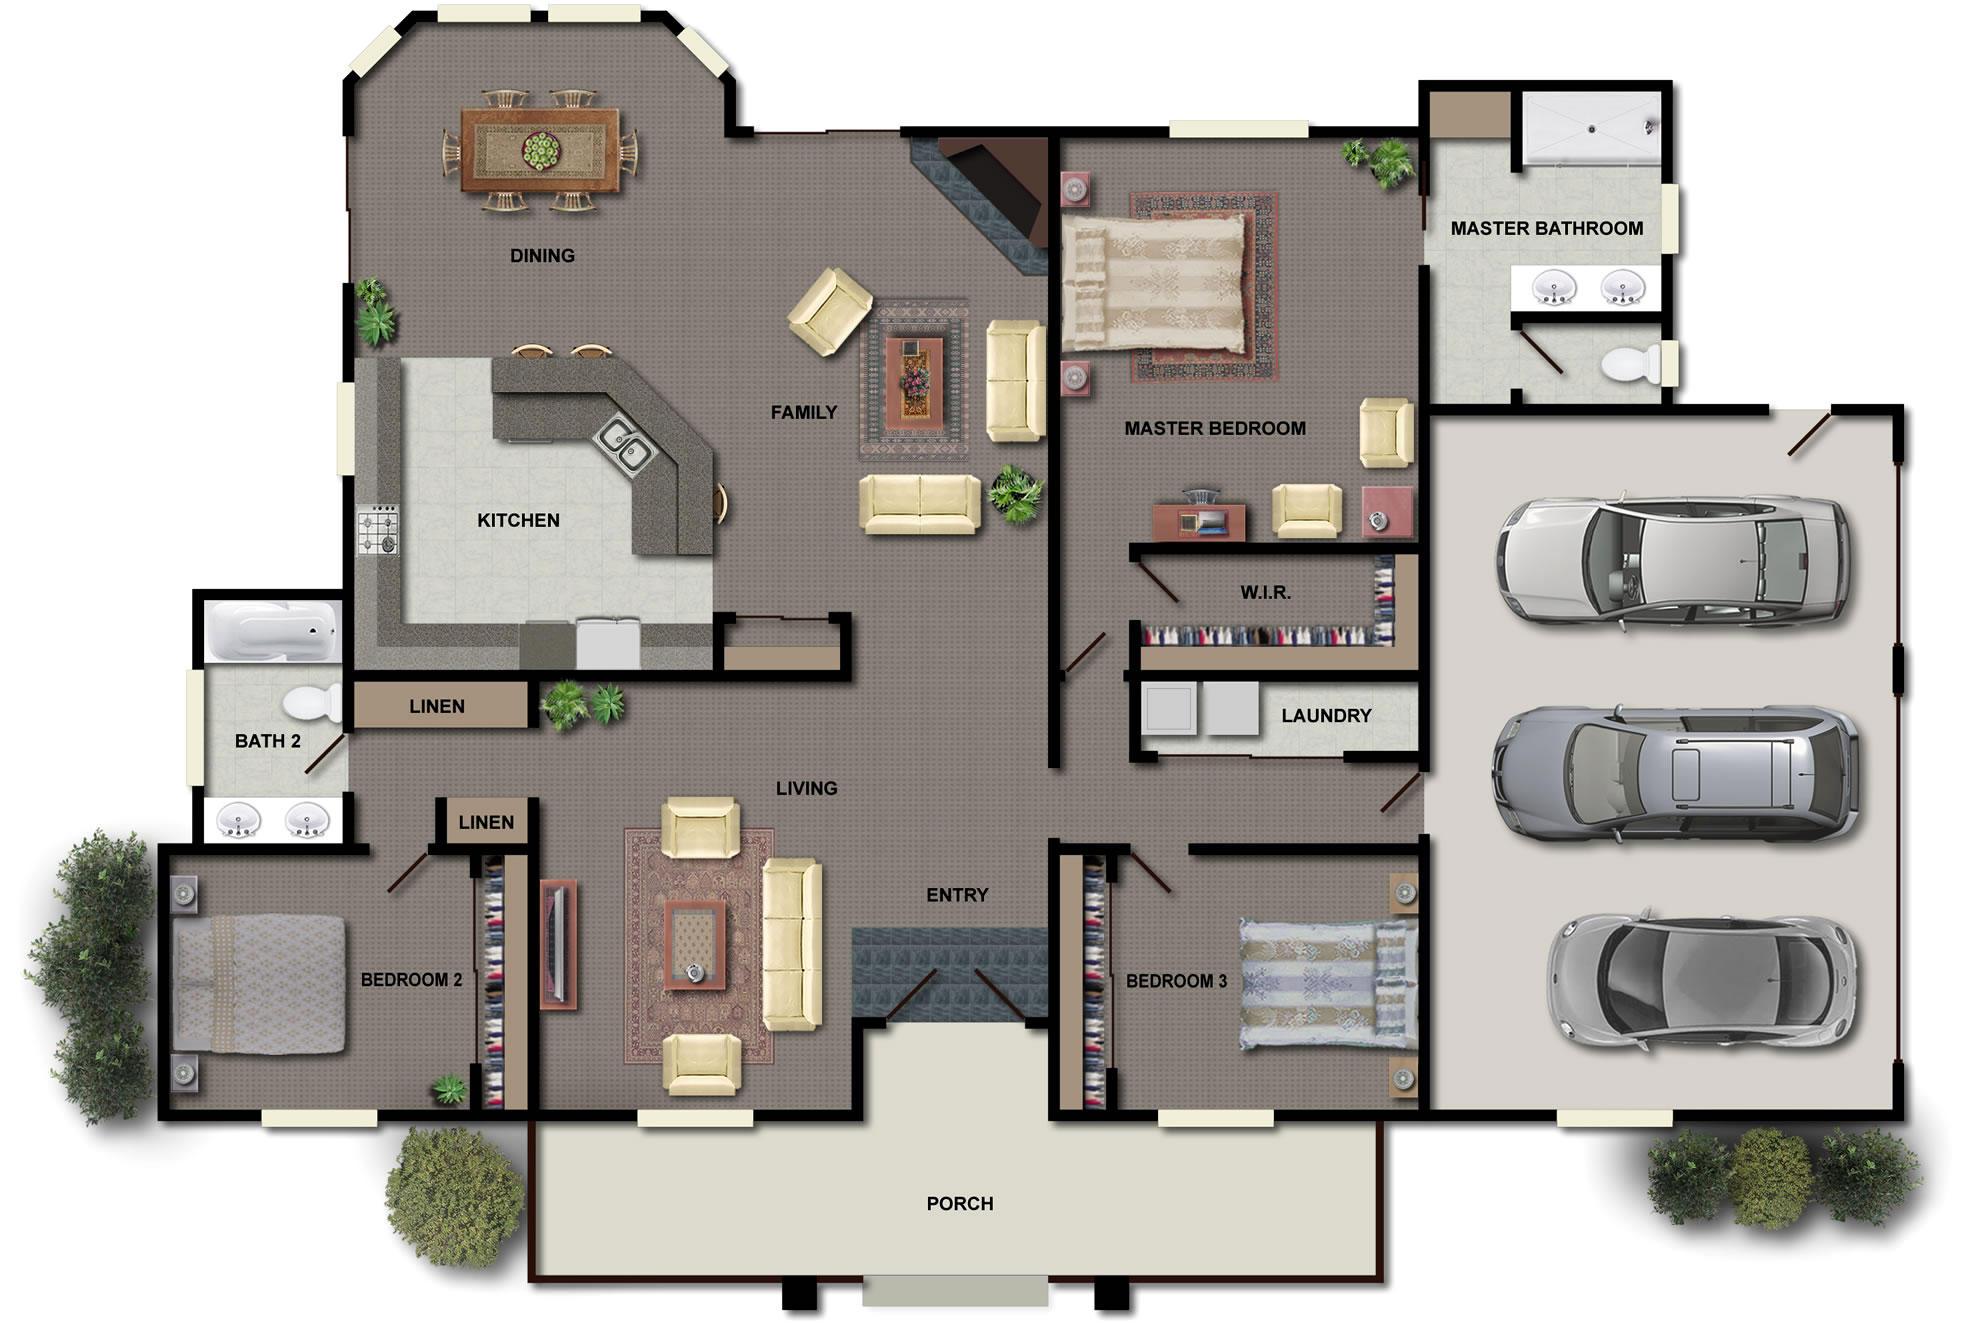 Drawn house own Home Design Home own design